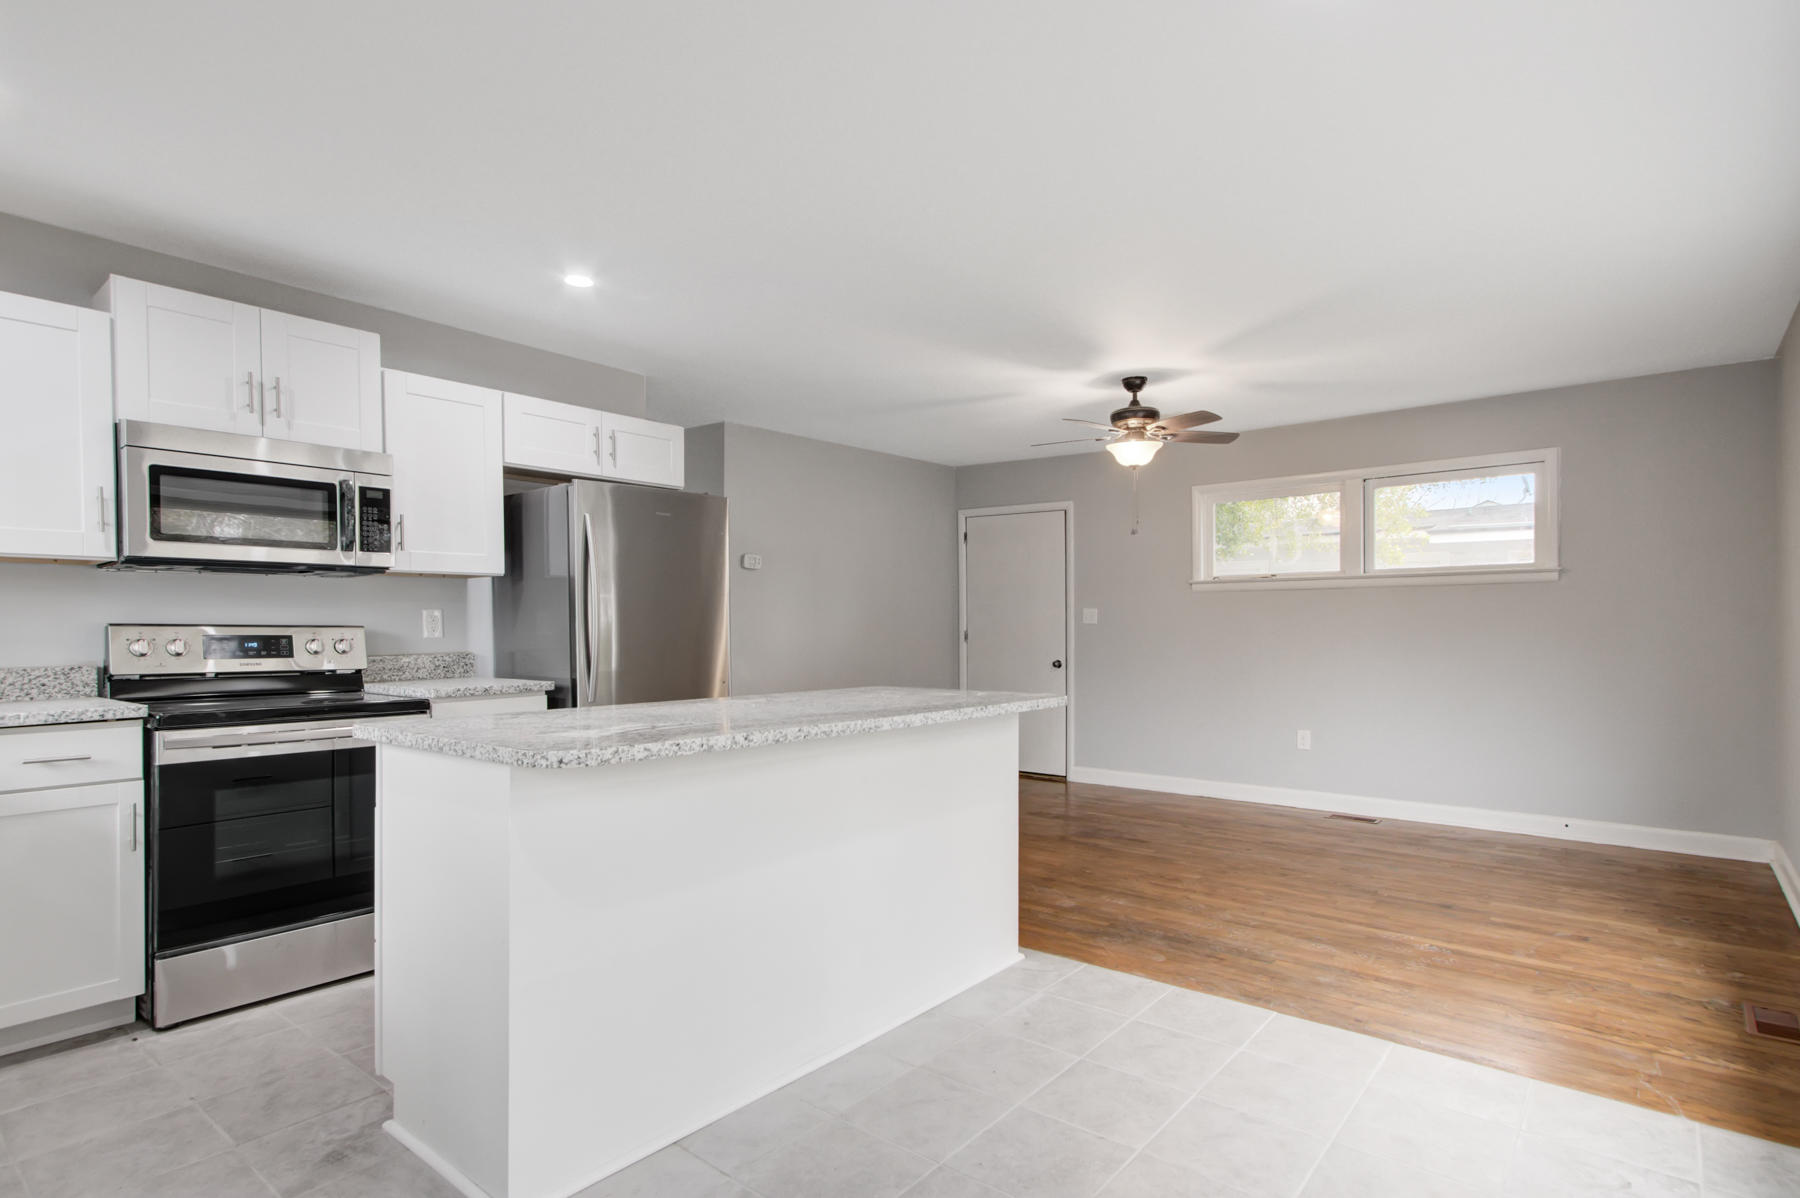 Port Park Homes For Sale - 5820 Sledge, Hanahan, SC - 4